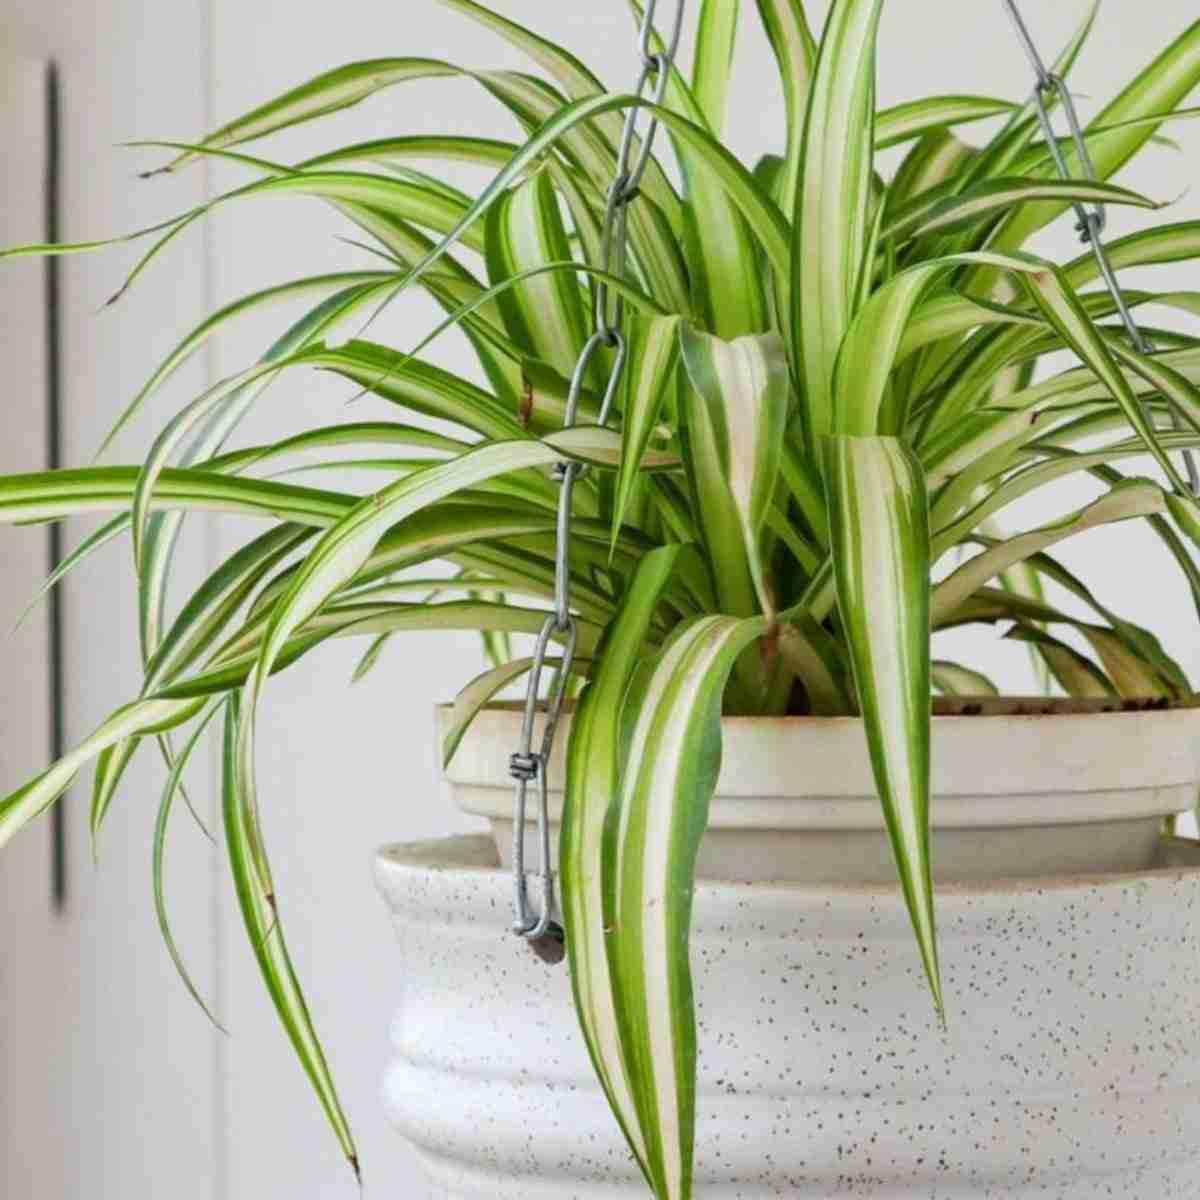 6 Plantas de invierno para decorar tu hogar 11